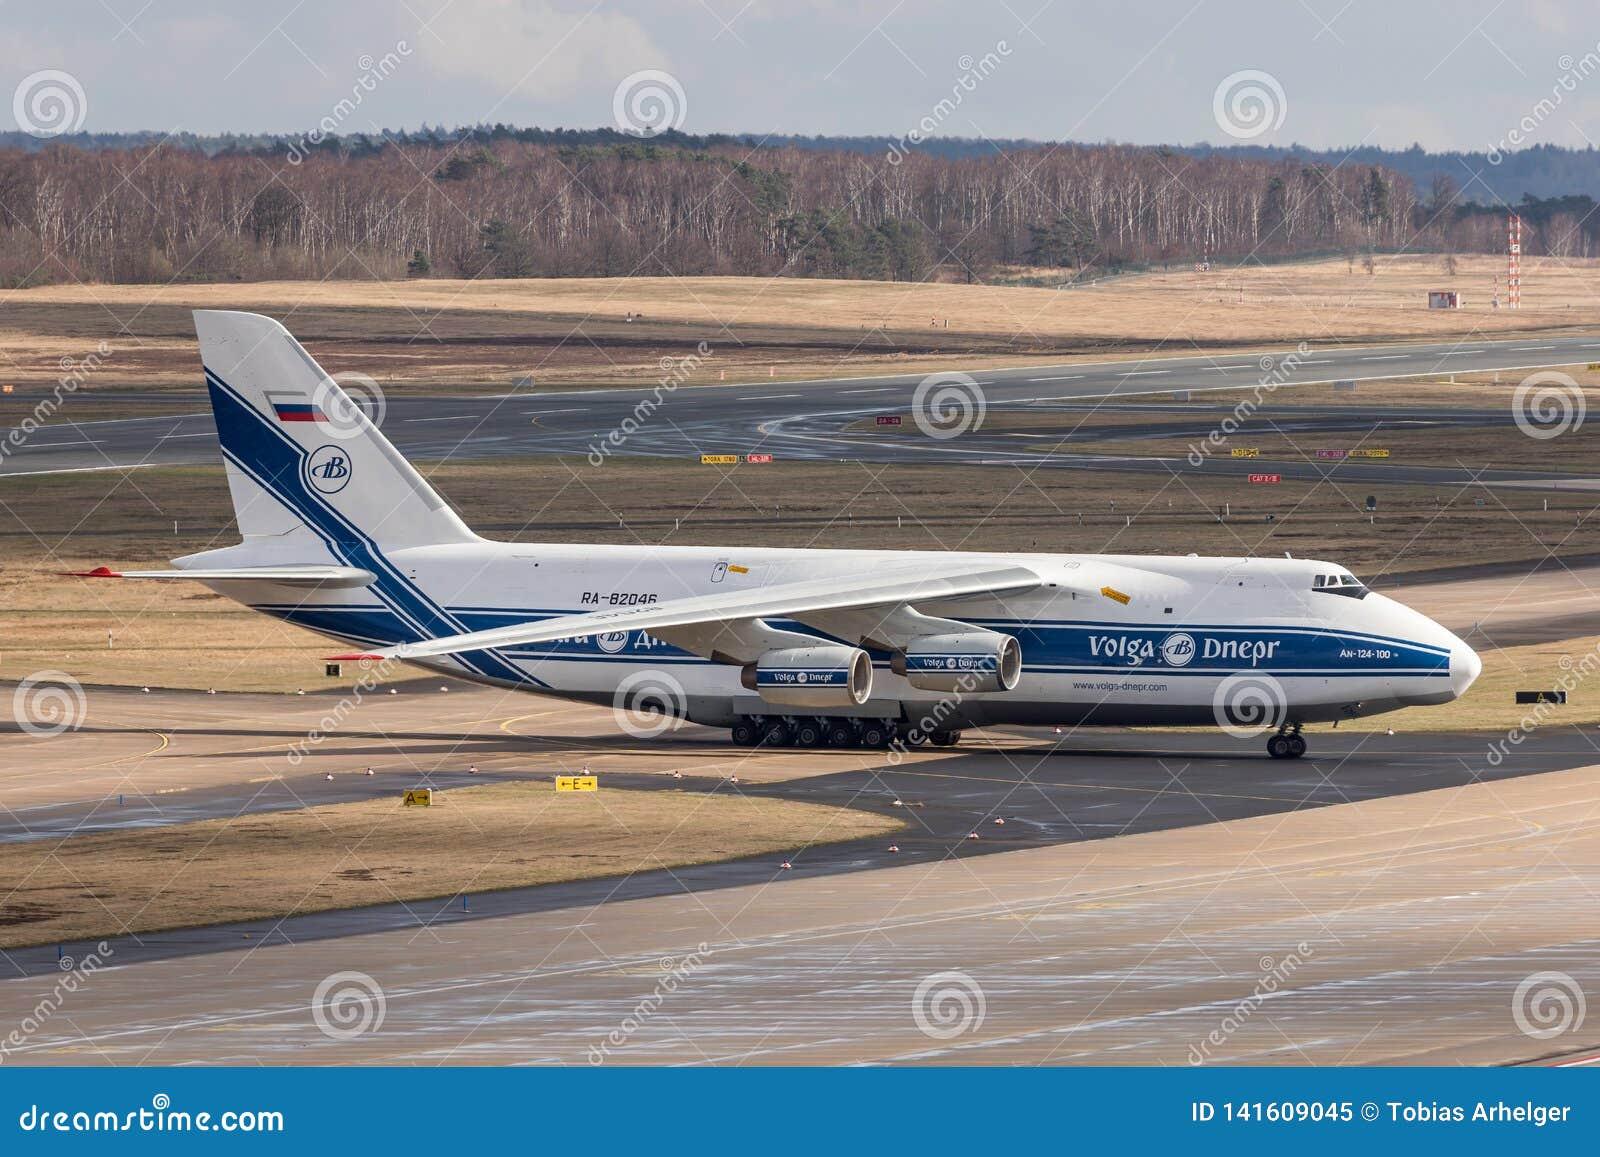 Kolonia nrw, Germany,/- 08 03 19: antonov 124 ładunku samolot przy cologne Bonn lotniskiem Germany